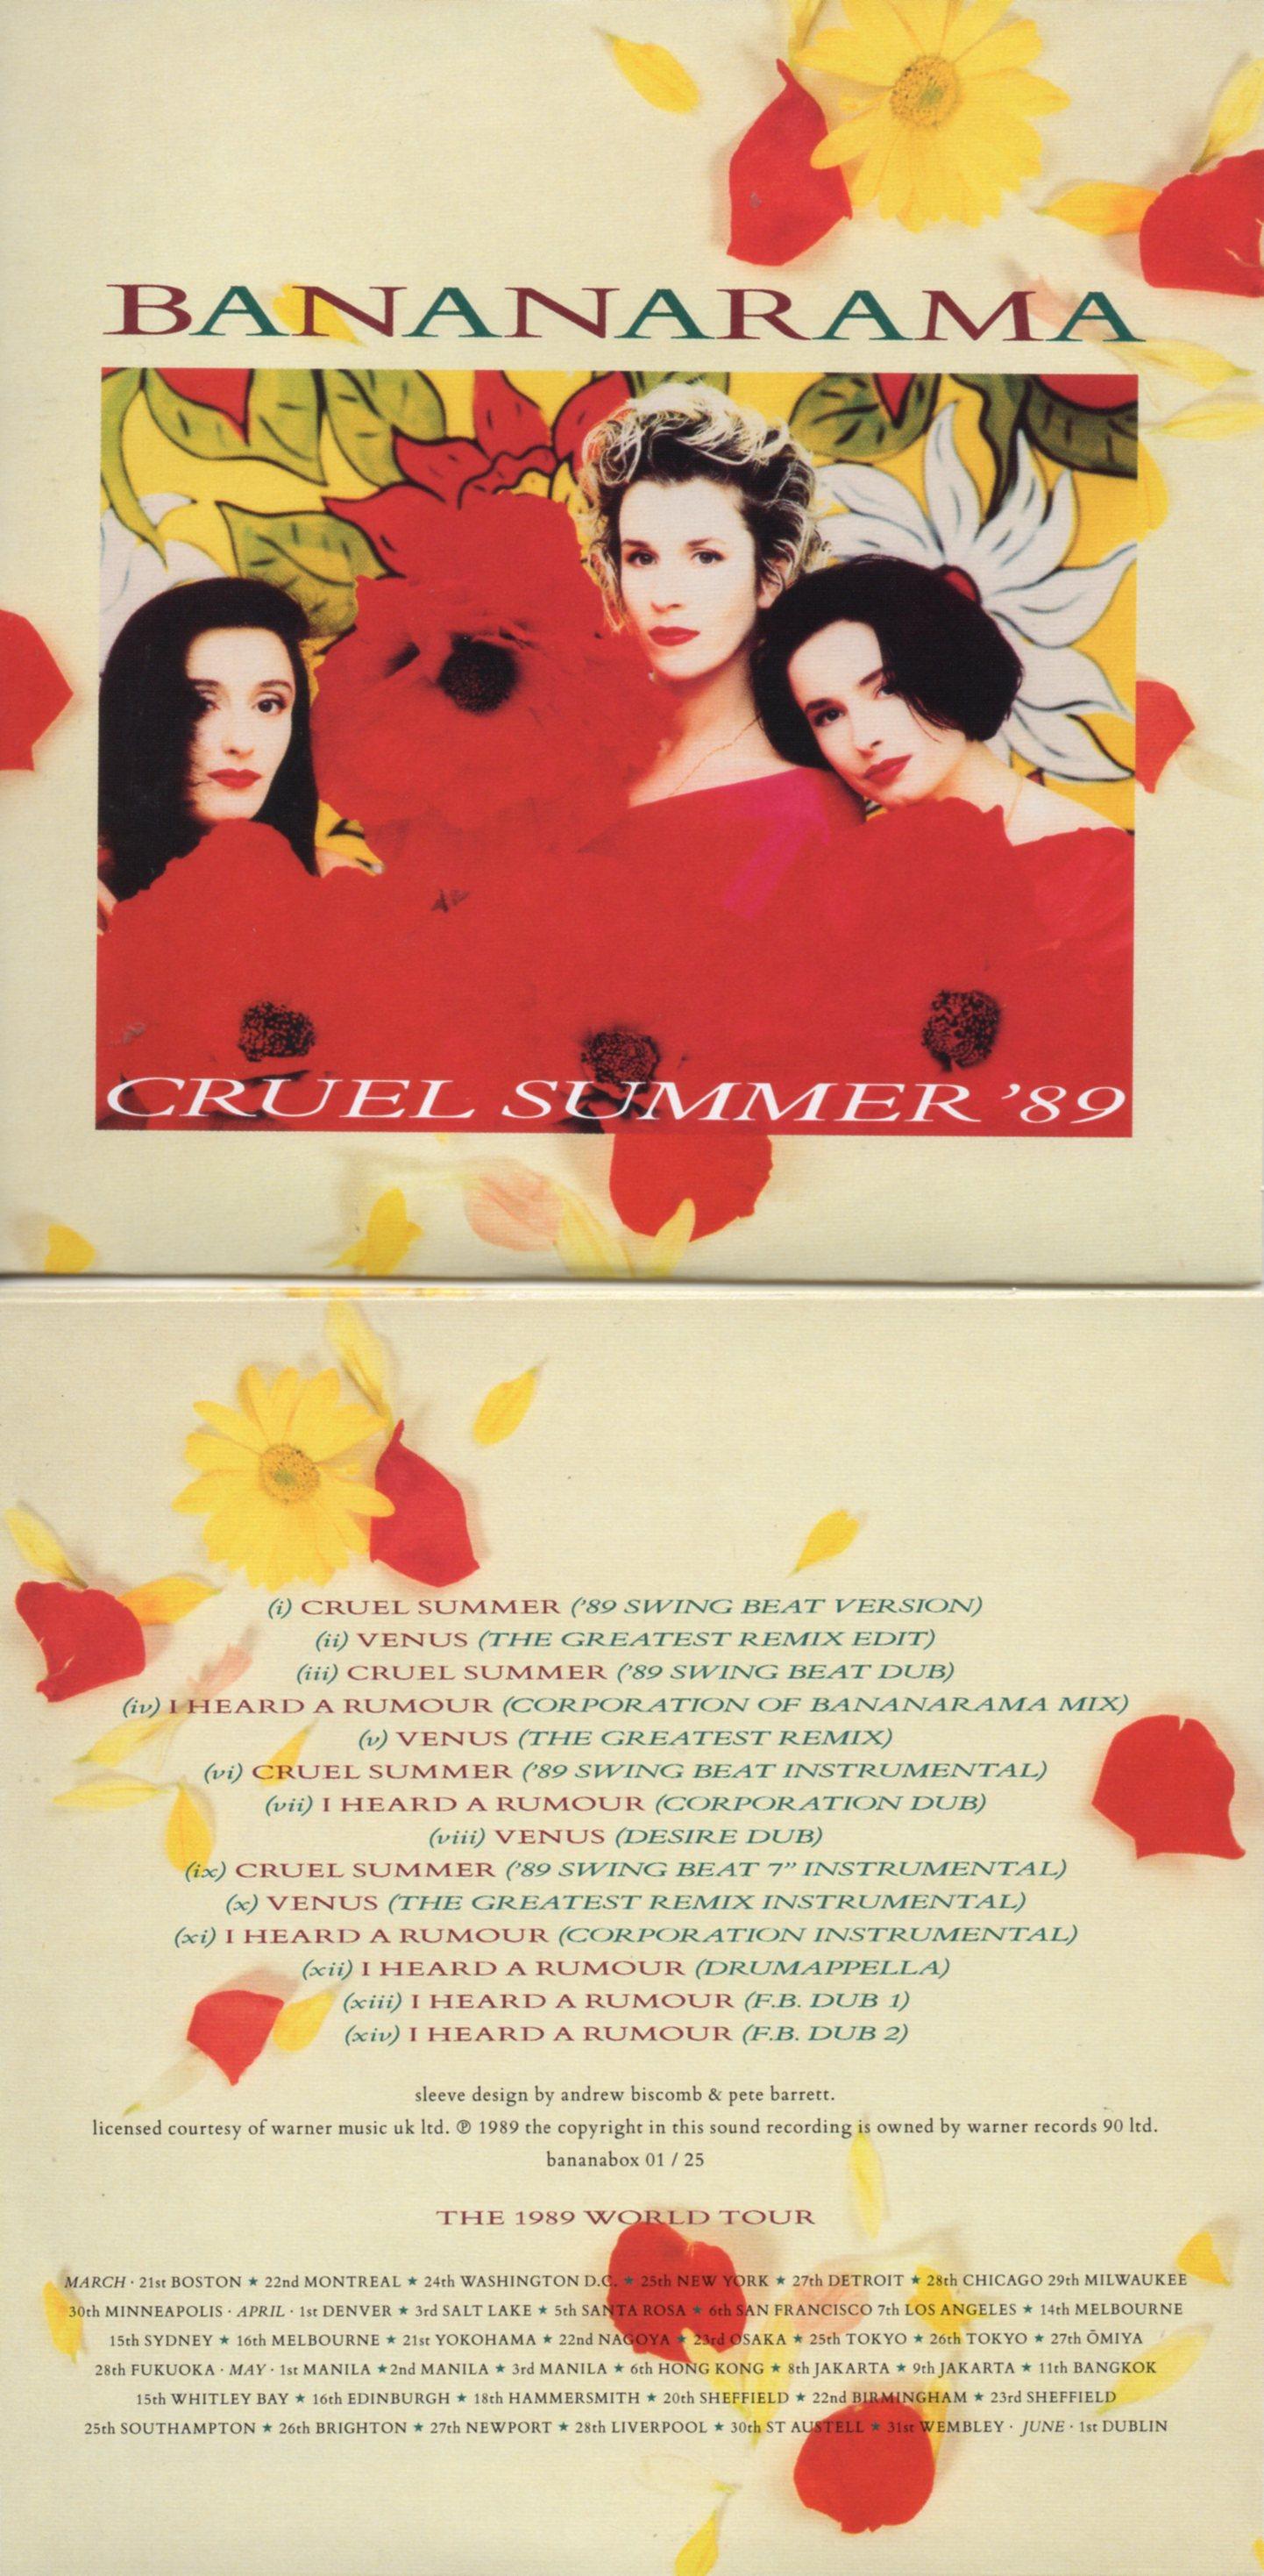 BANANARAMA - CRUEL SUMMER '89 (1989) 14-TRACK CARD SLEEVE - CD single